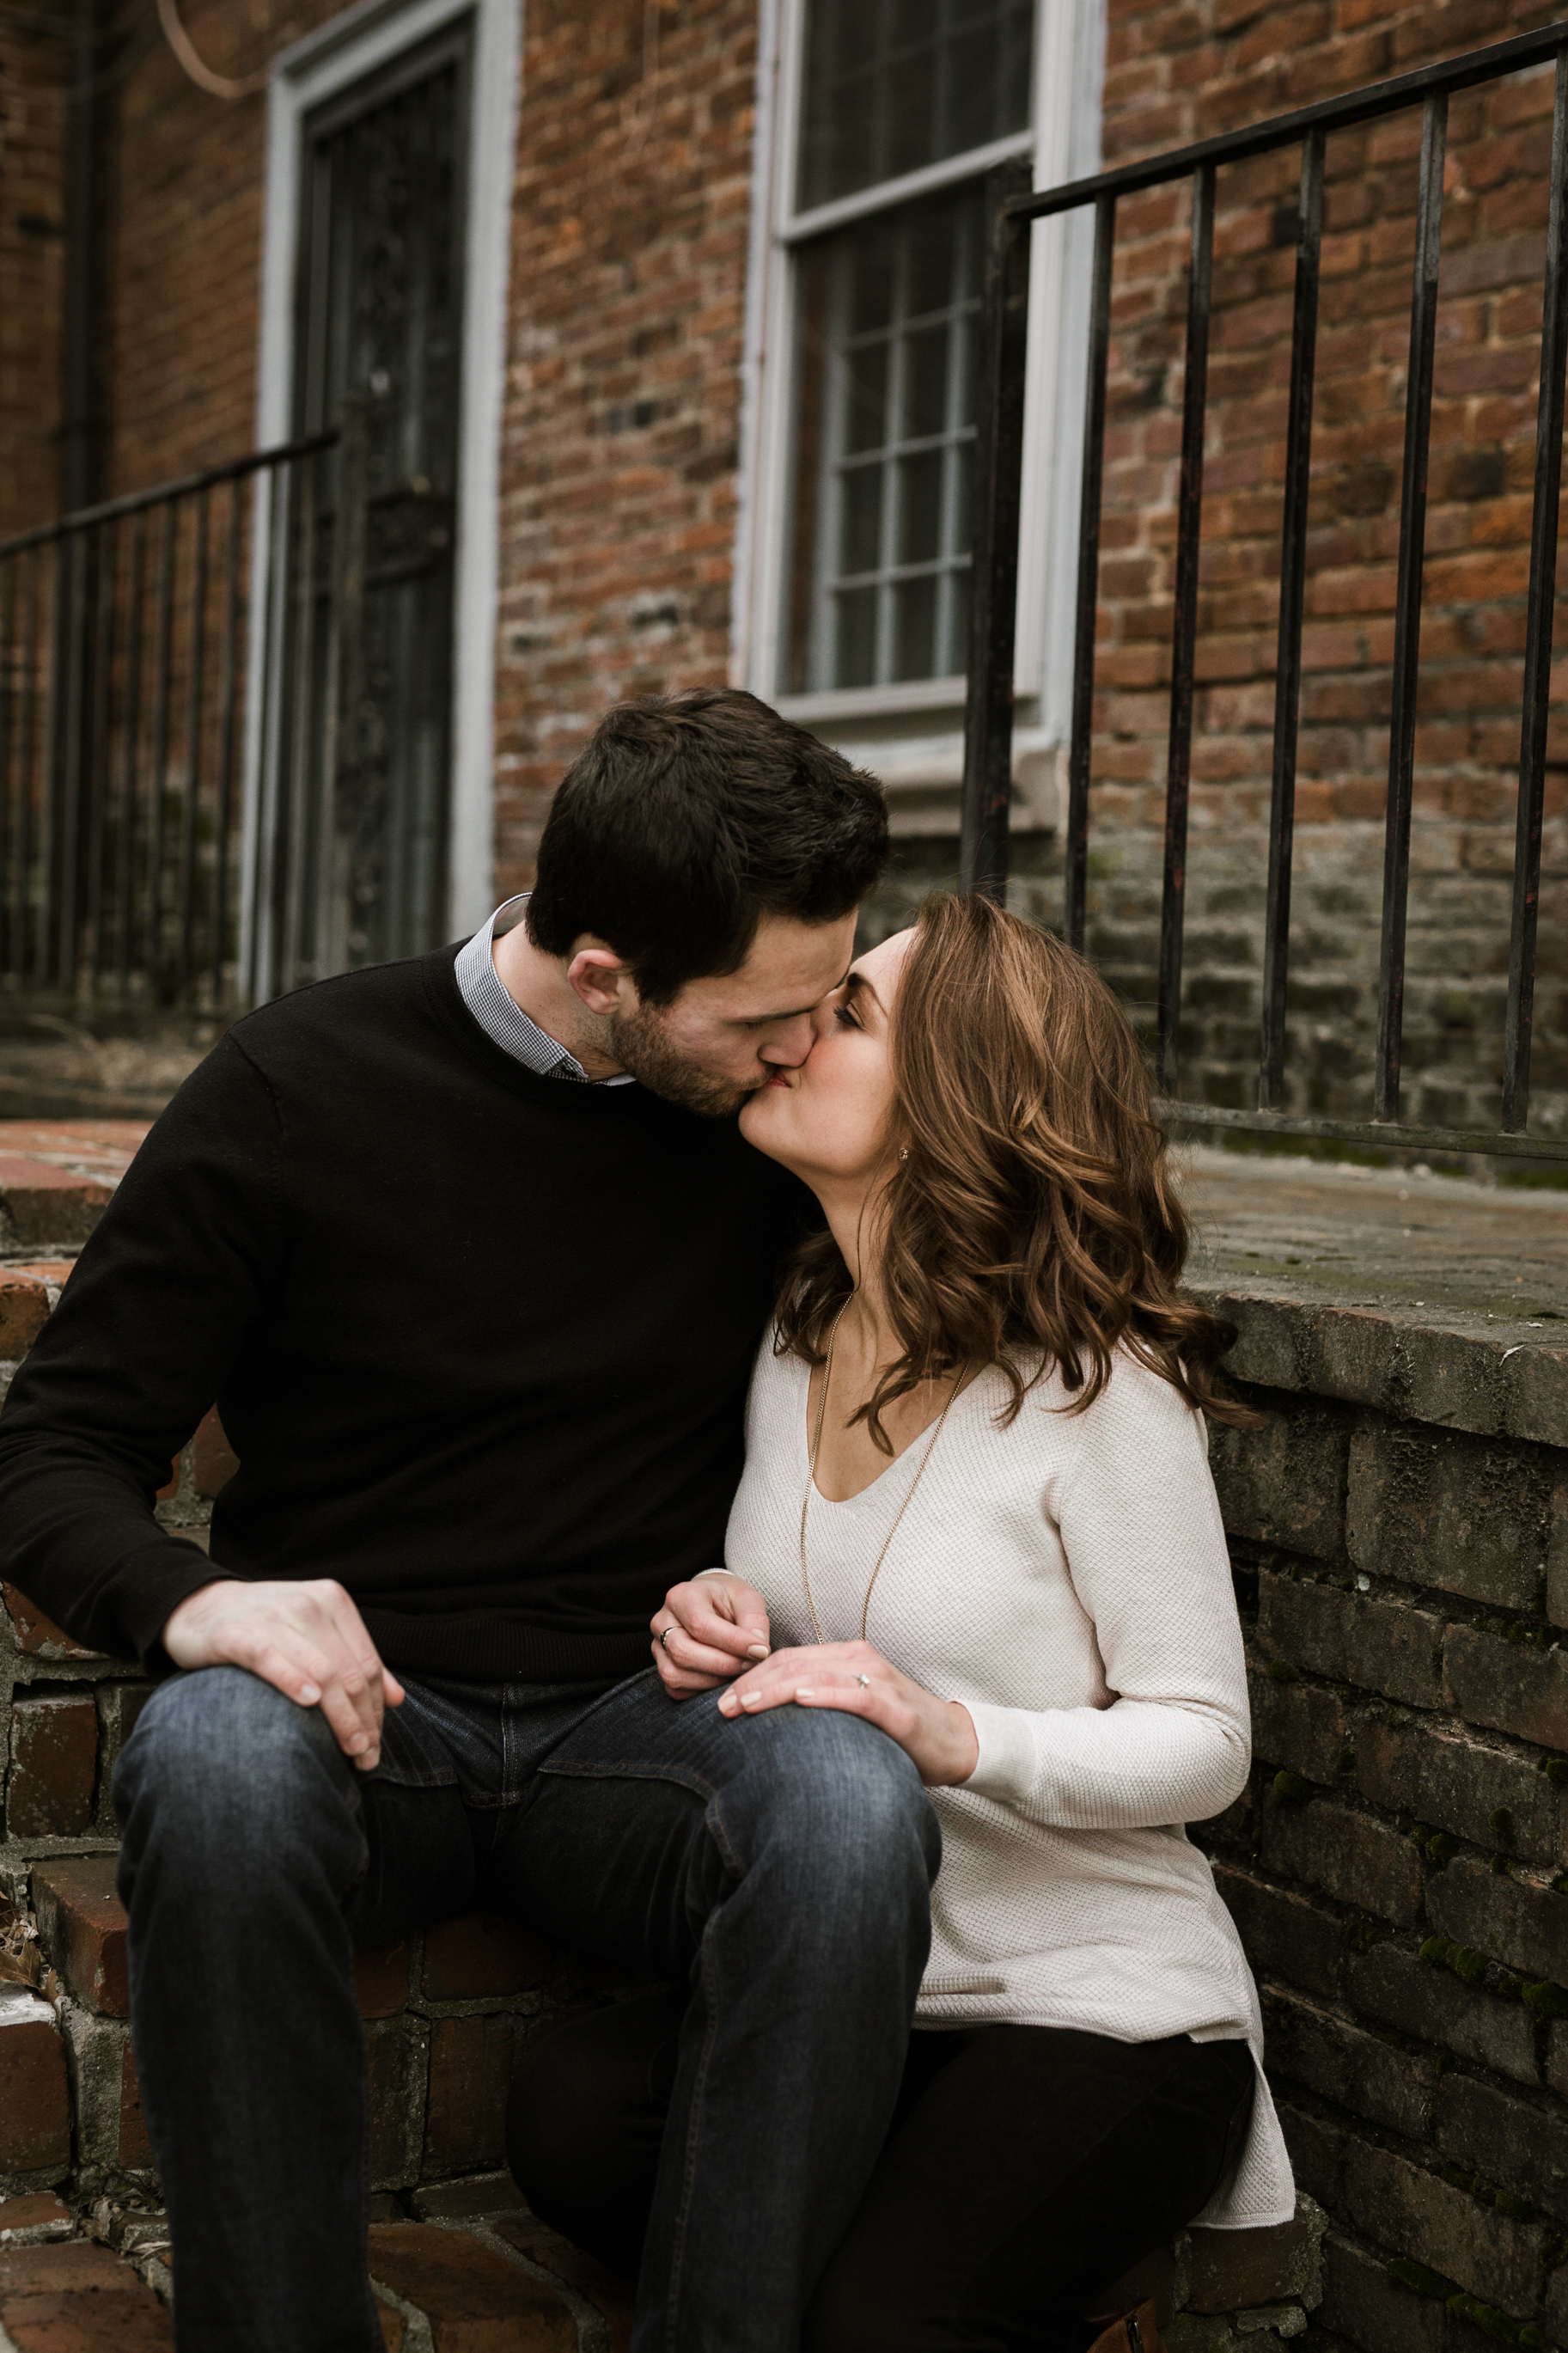 Ellen & Lee Engagement 2018 WEBSITE SP Crystal Ludwick Photo (17 of 54).jpg